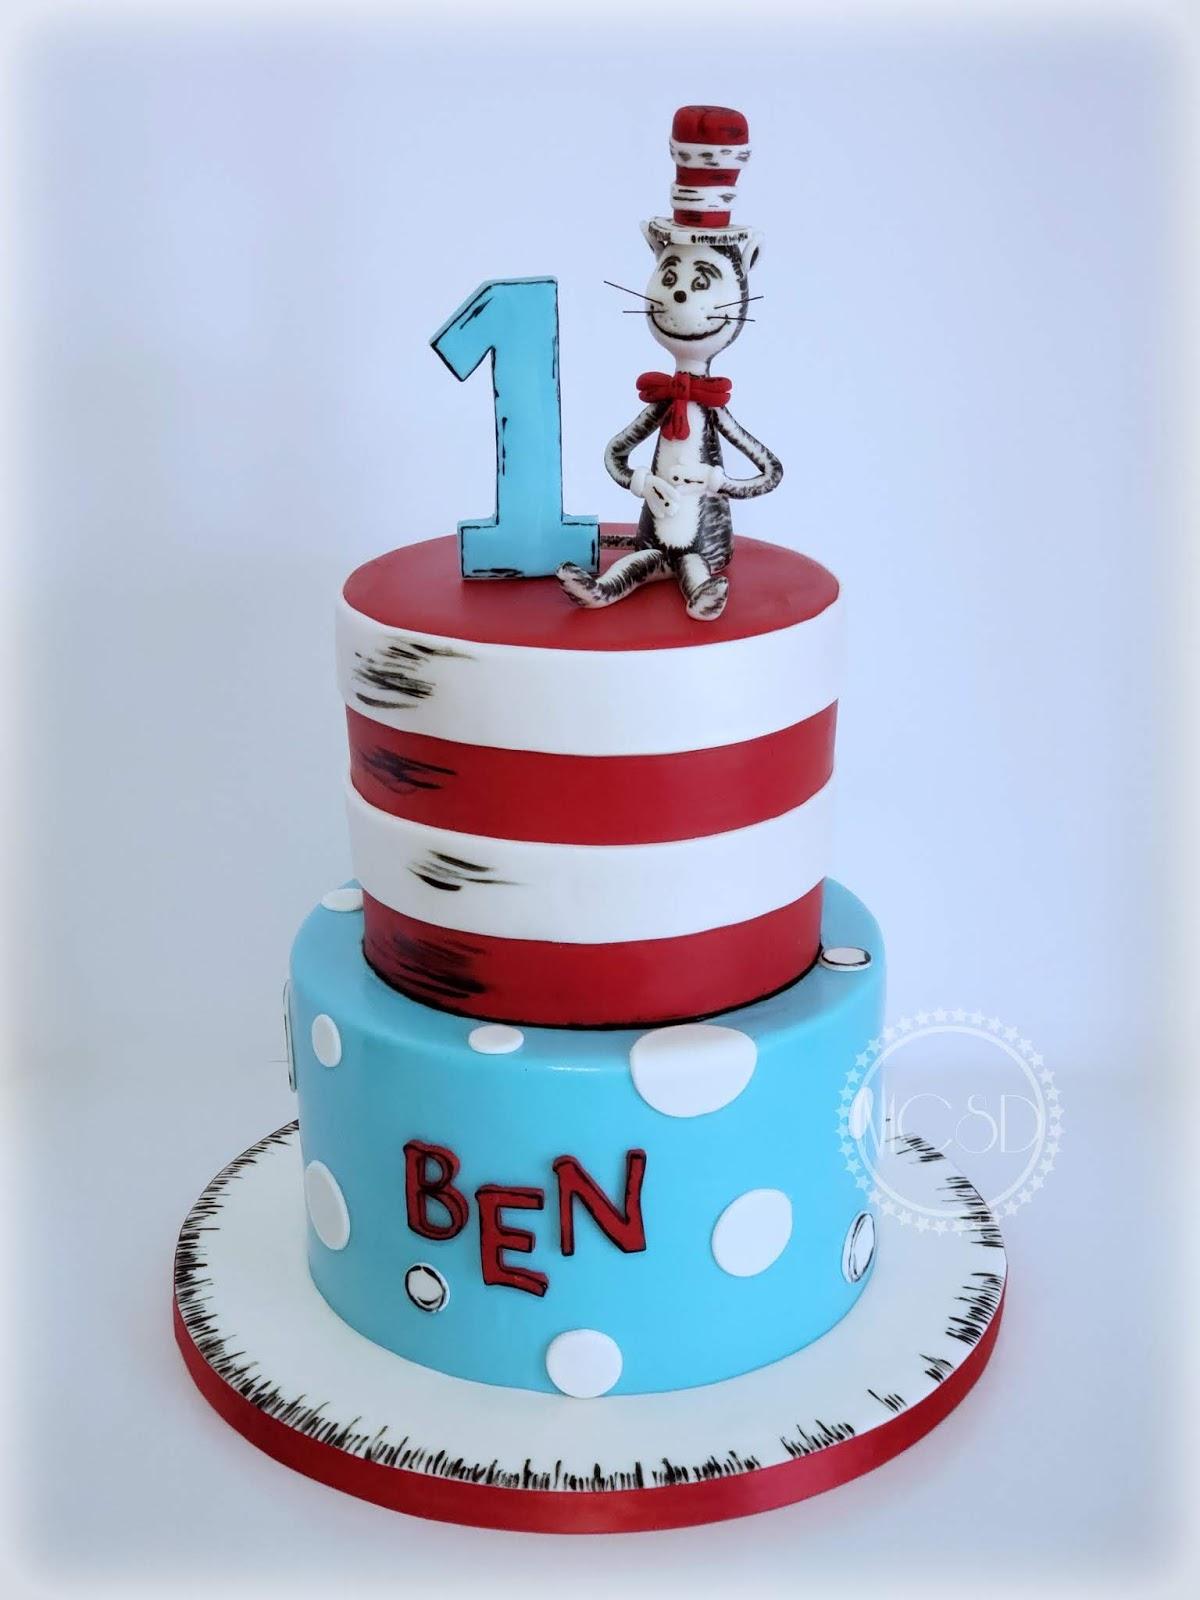 Remarkable Cakesbyzana Cat In The Hat Dr Seuss 1St Birthday Cake Funny Birthday Cards Online Elaedamsfinfo